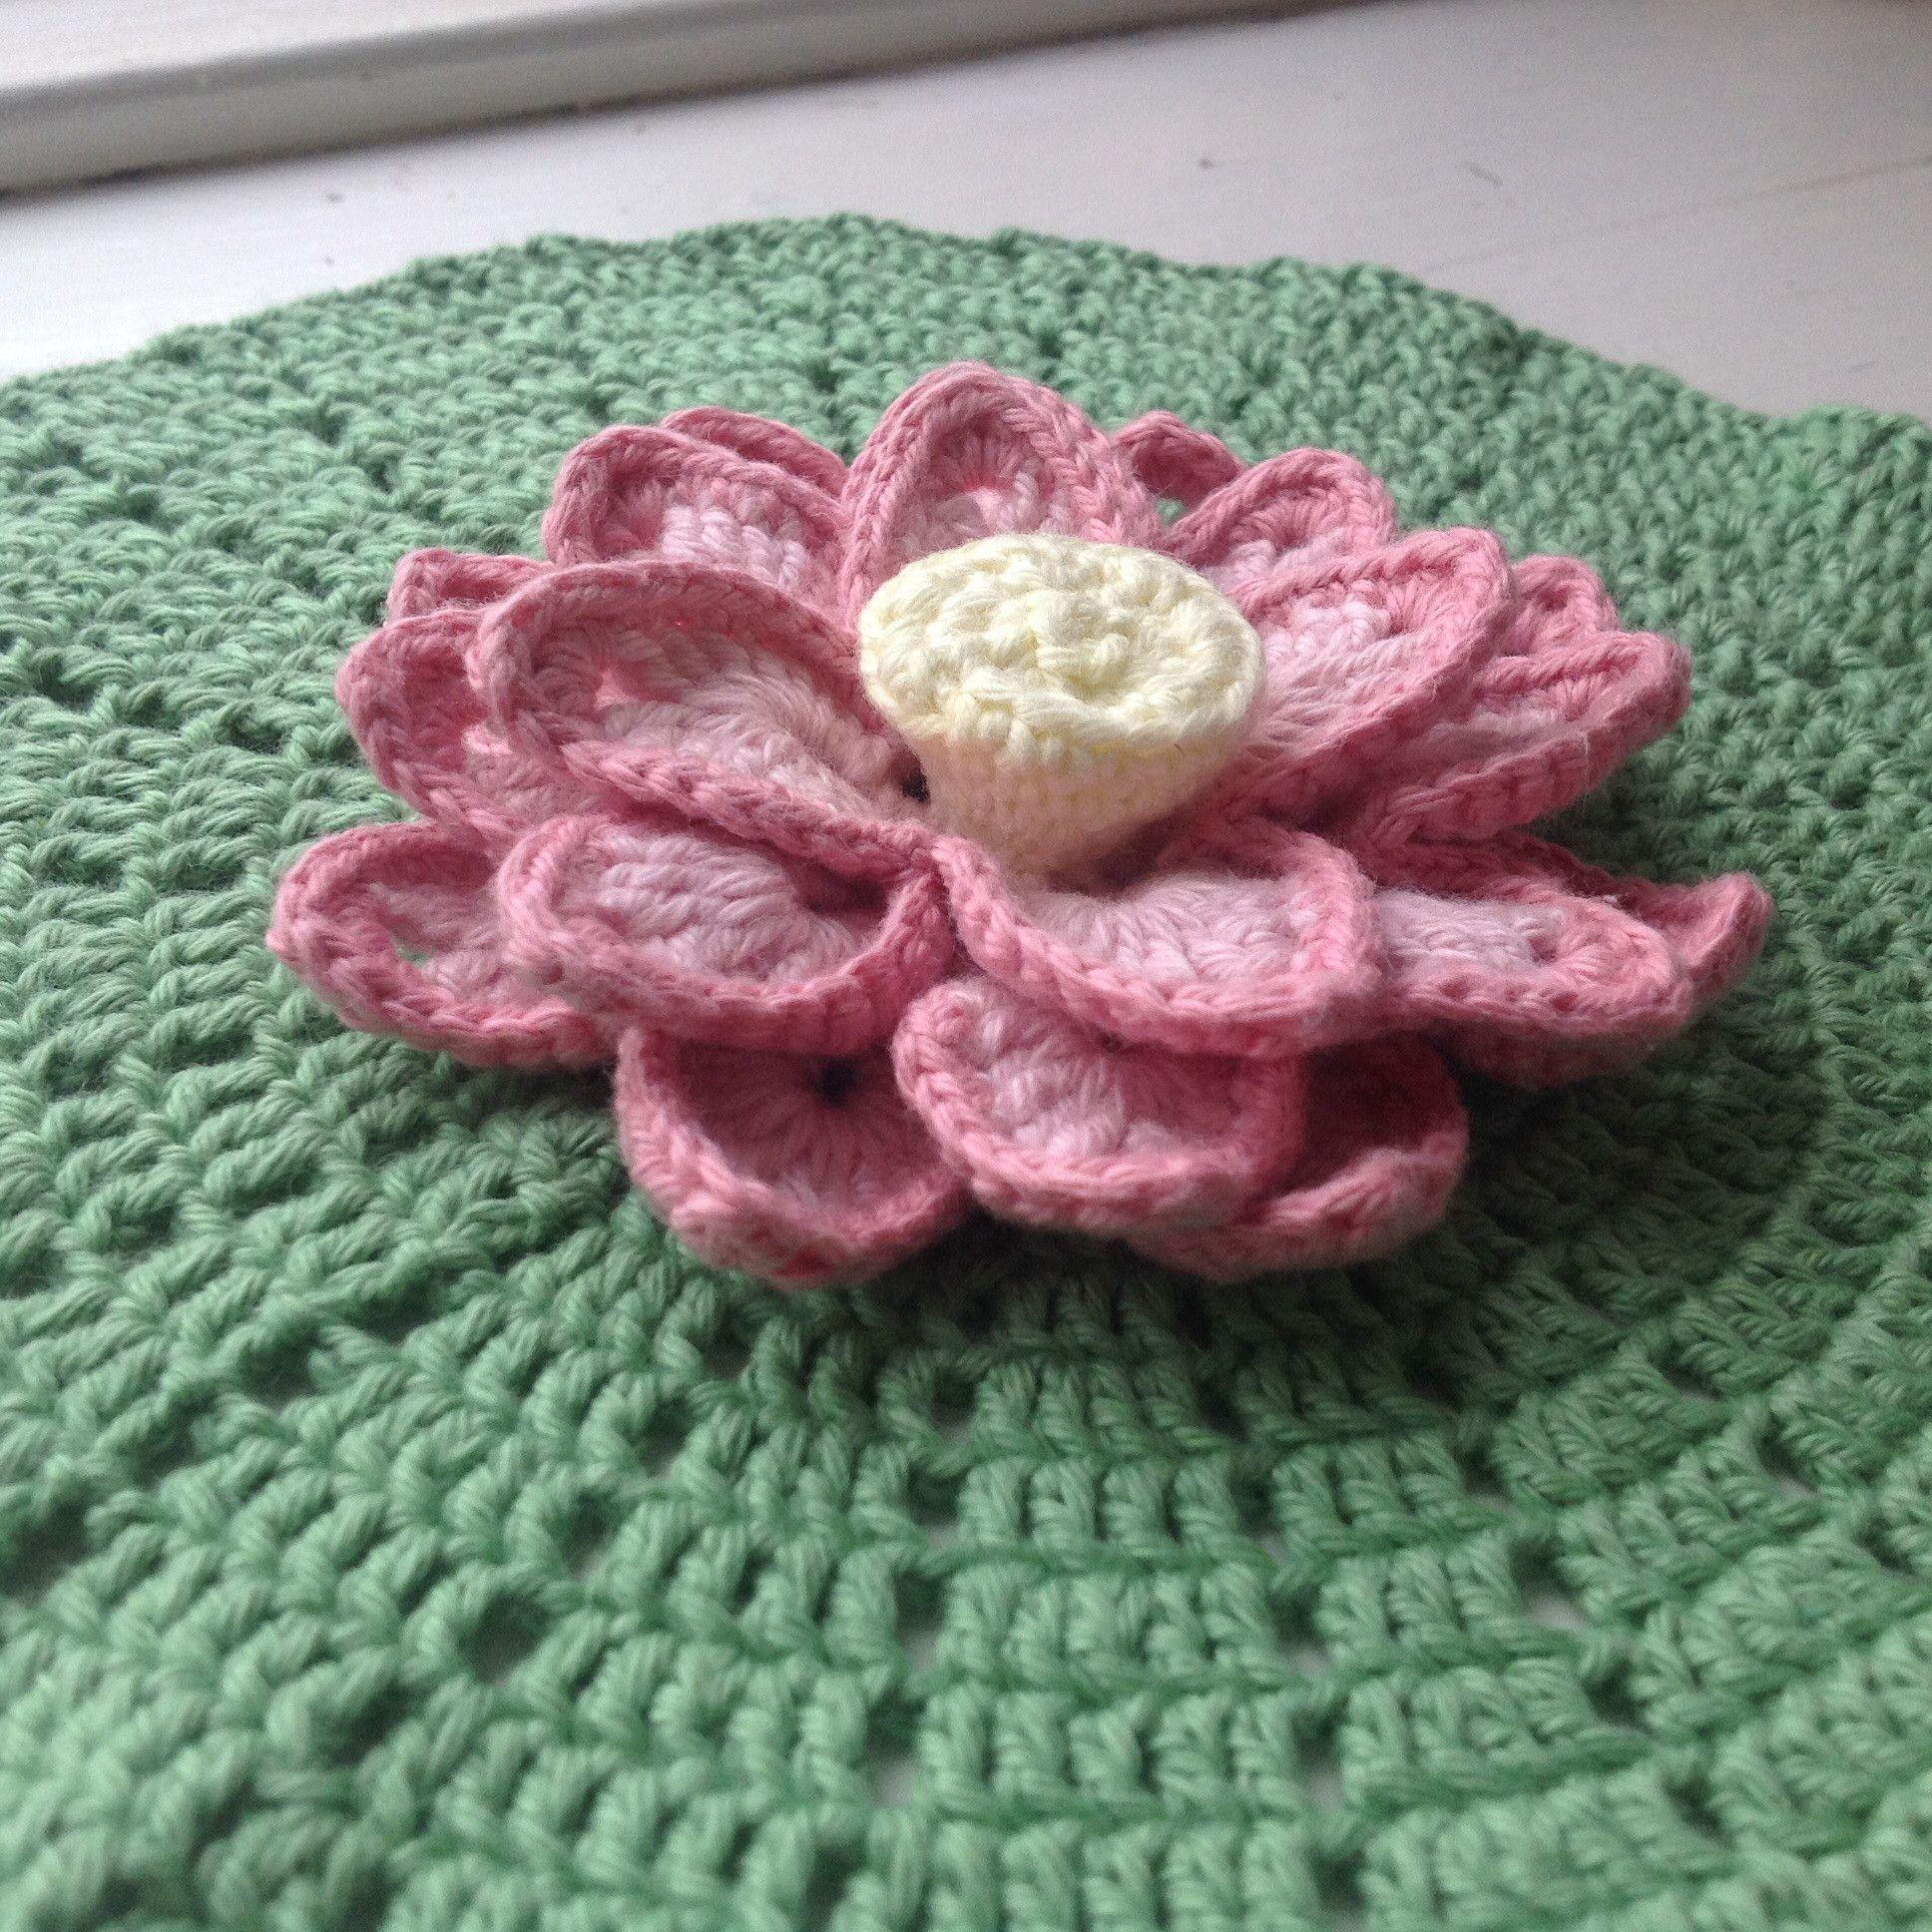 Suvis crochet lotus flower free crochet pattern with pictures suvis crochet lotus flower free crochet pattern with pictures and chart bankloansurffo Choice Image